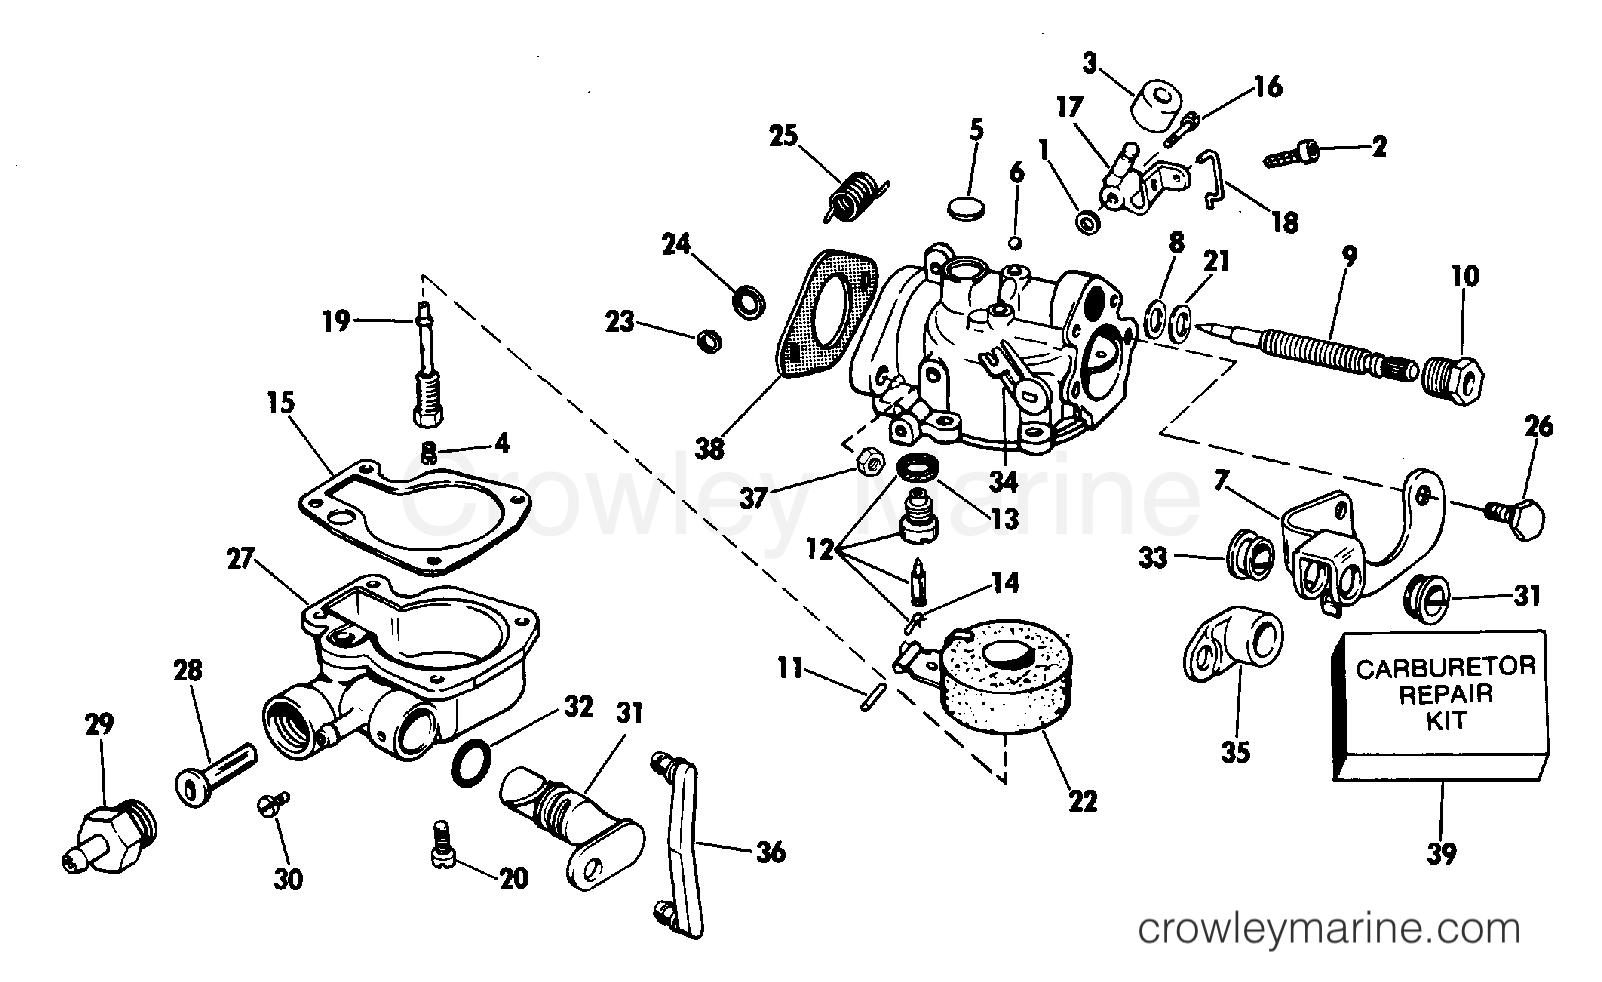 1980 Yamaha Xs650 Carburetor | Wiring Diagram Database